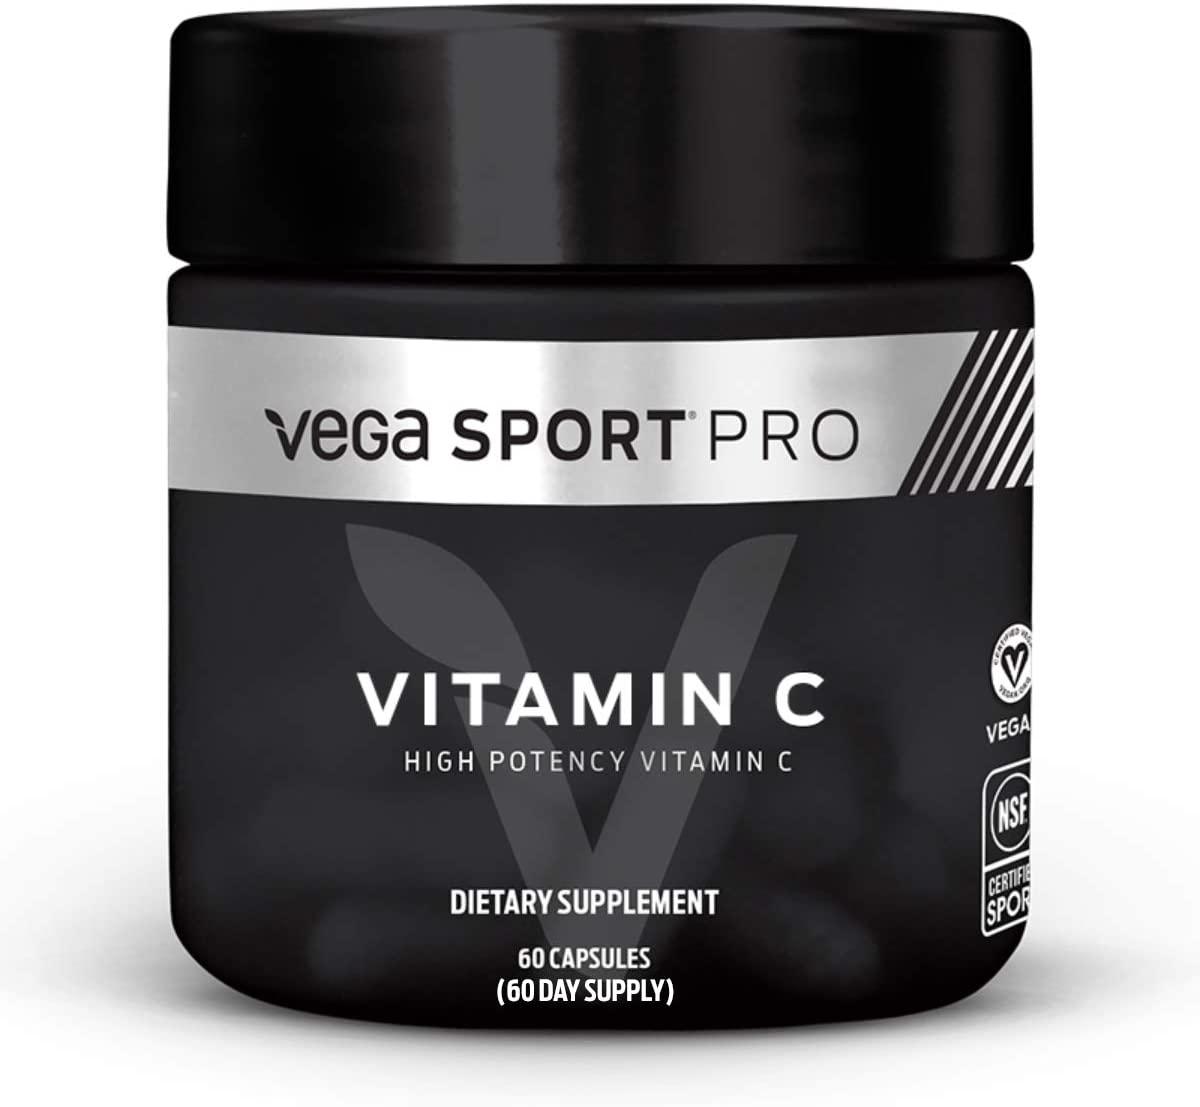 Vega Sport Pro Supplements, Vitamin C (60 Capsules) - NSF Certified, Certified Vegan, Gluten Free Pills